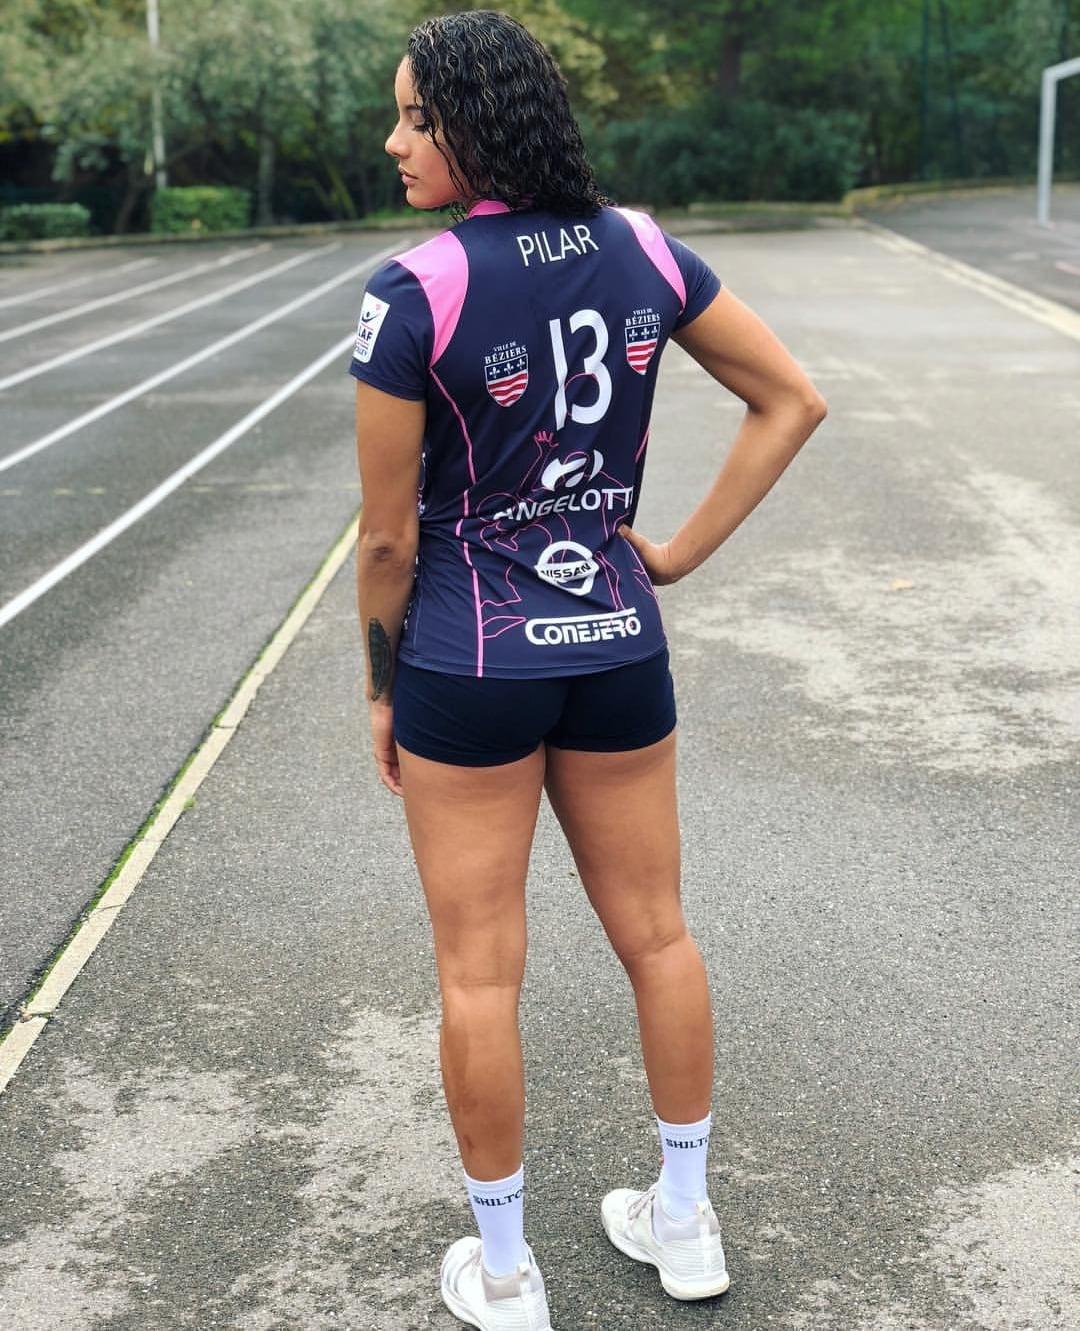 nouveau-maillot-volley-beziers-angels-shilton-2018-2019-laf-lnv-7